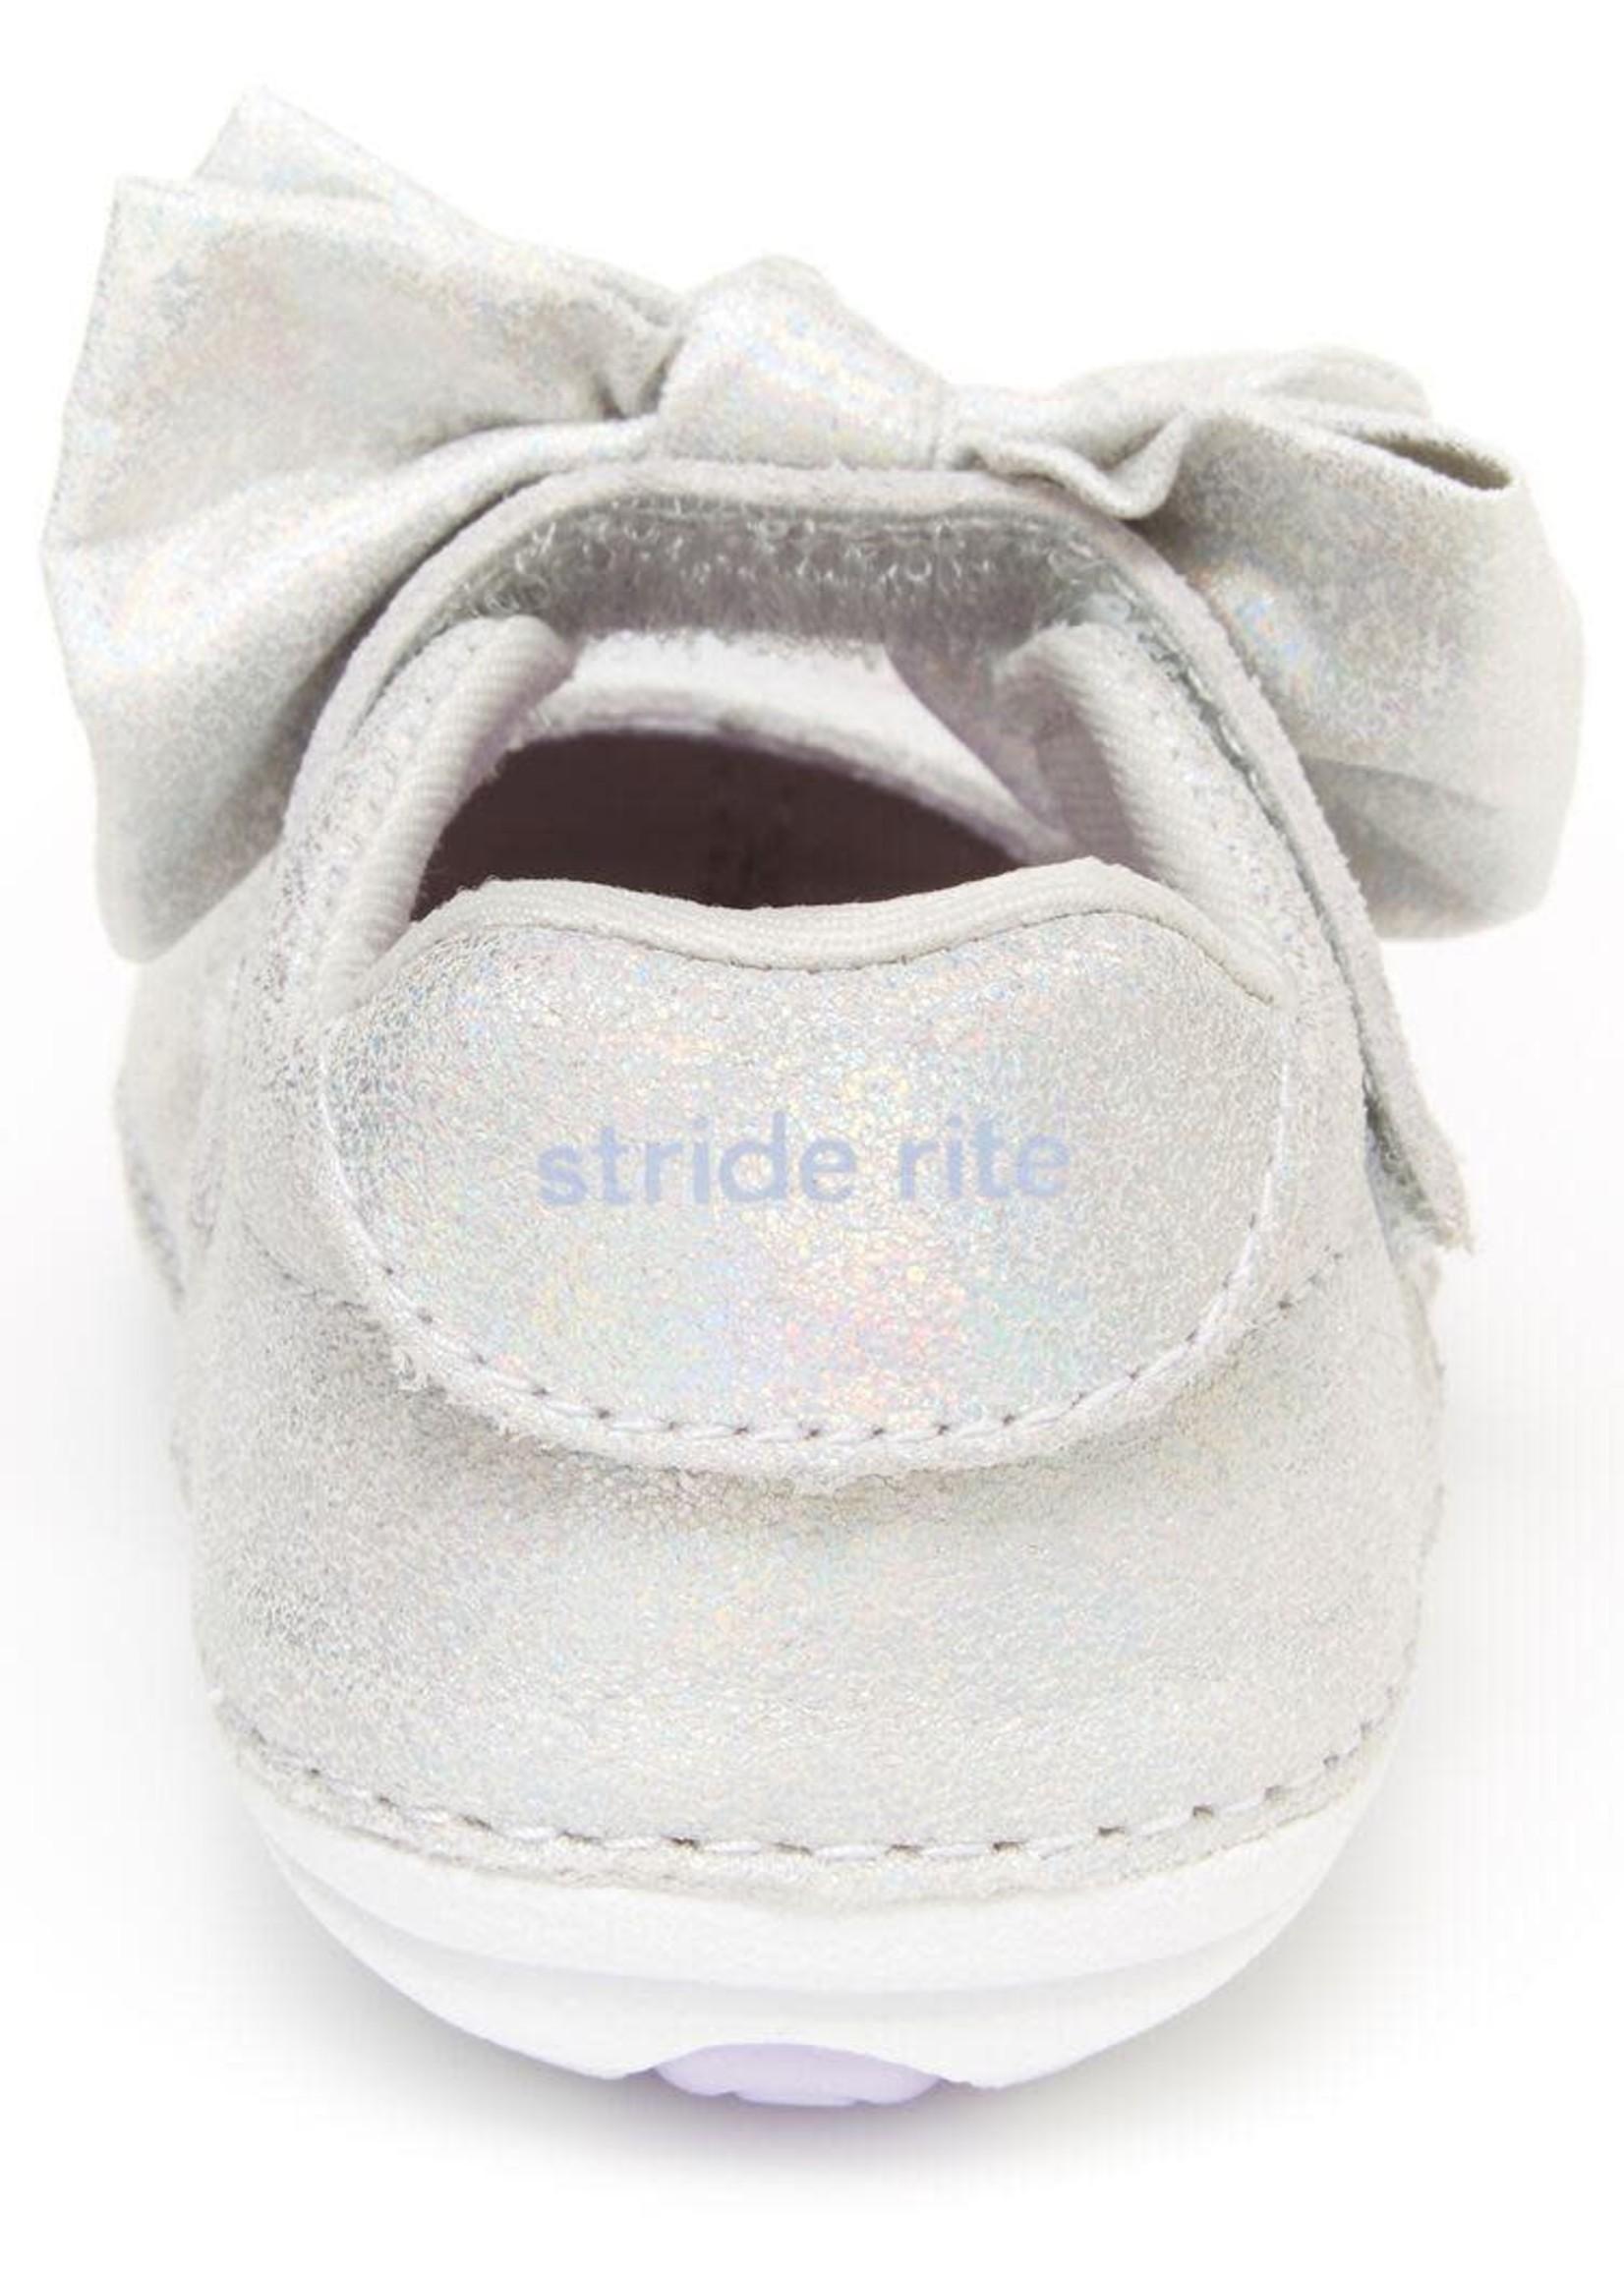 Striderite Stride Rite, Esme, Soft sole Mary Jane with Bow - P-61357